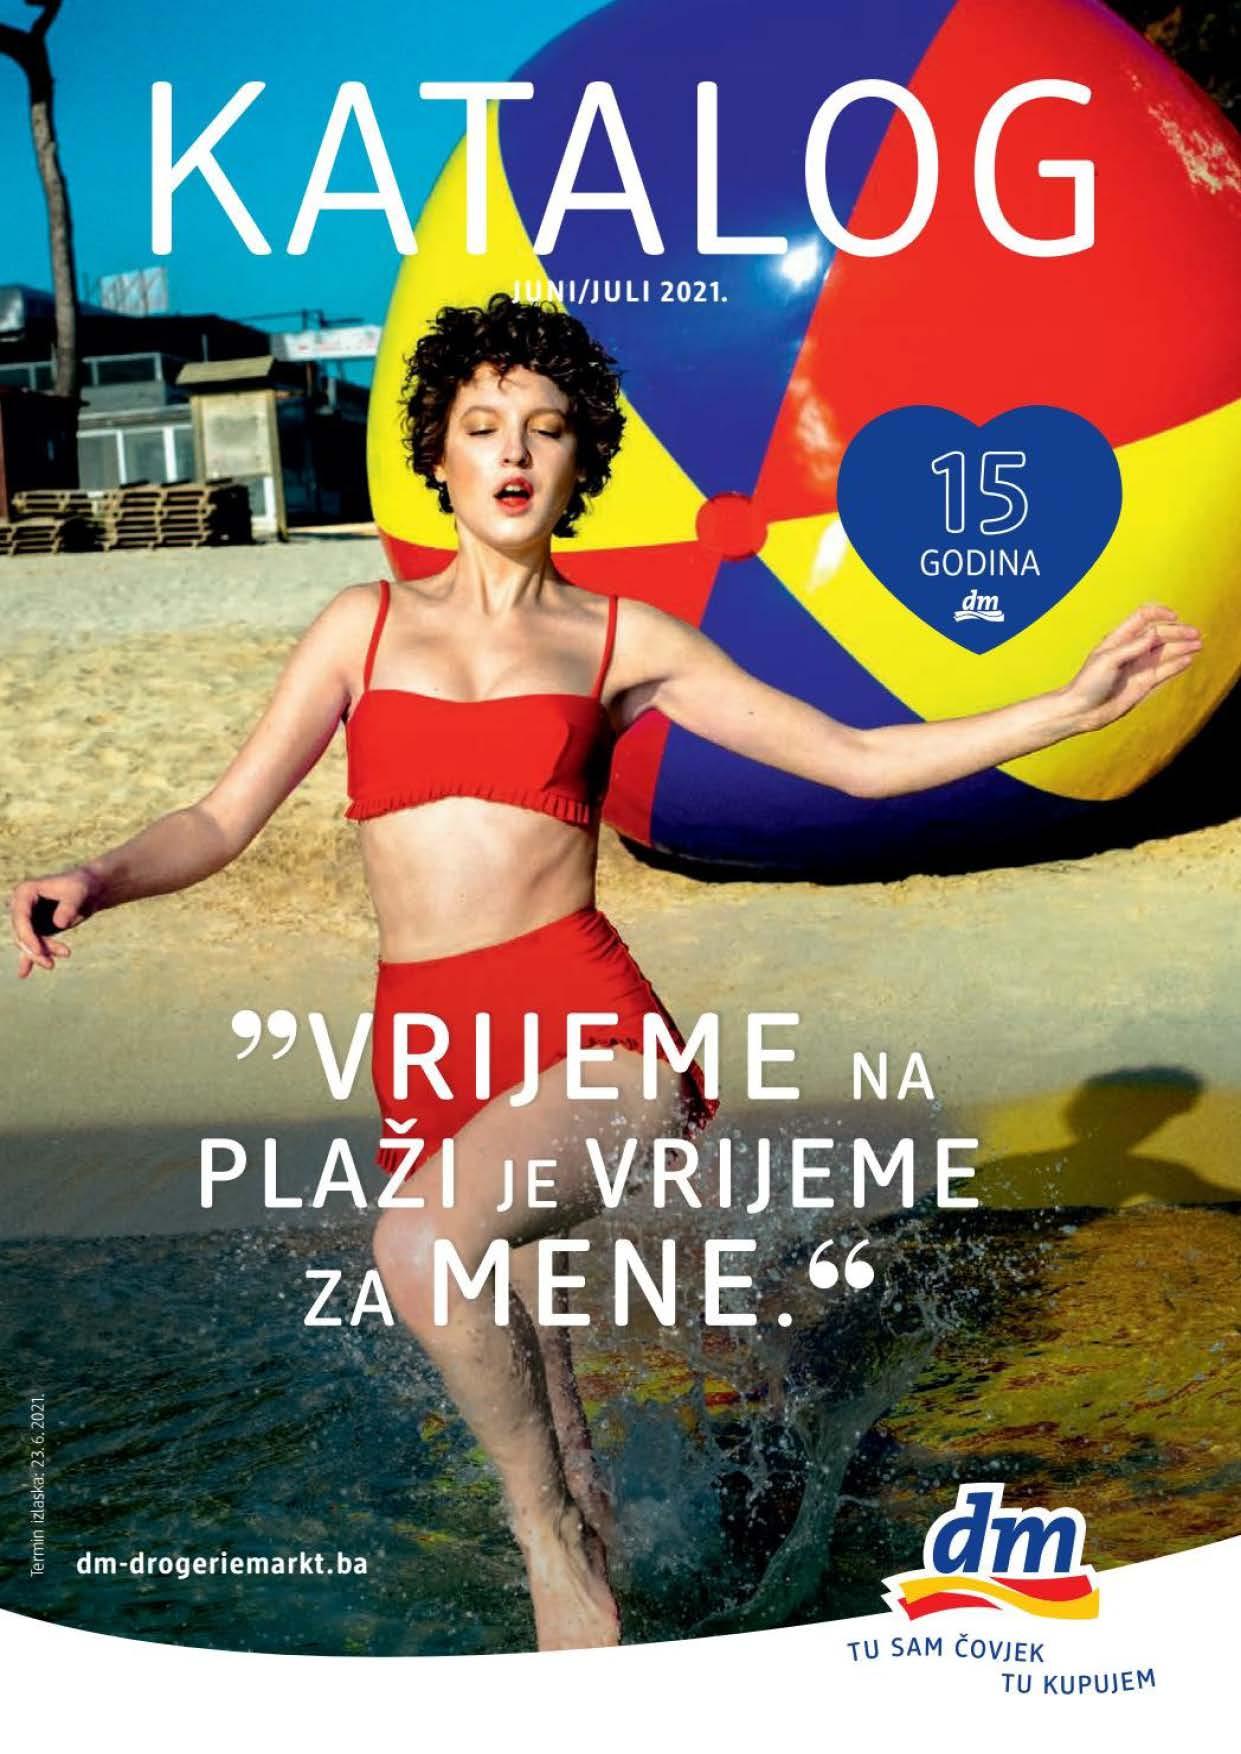 DM Katalog BiH JUN JUL 2021 23.6.2021. 6.7.2021. eKatalozi.com PR Page 01